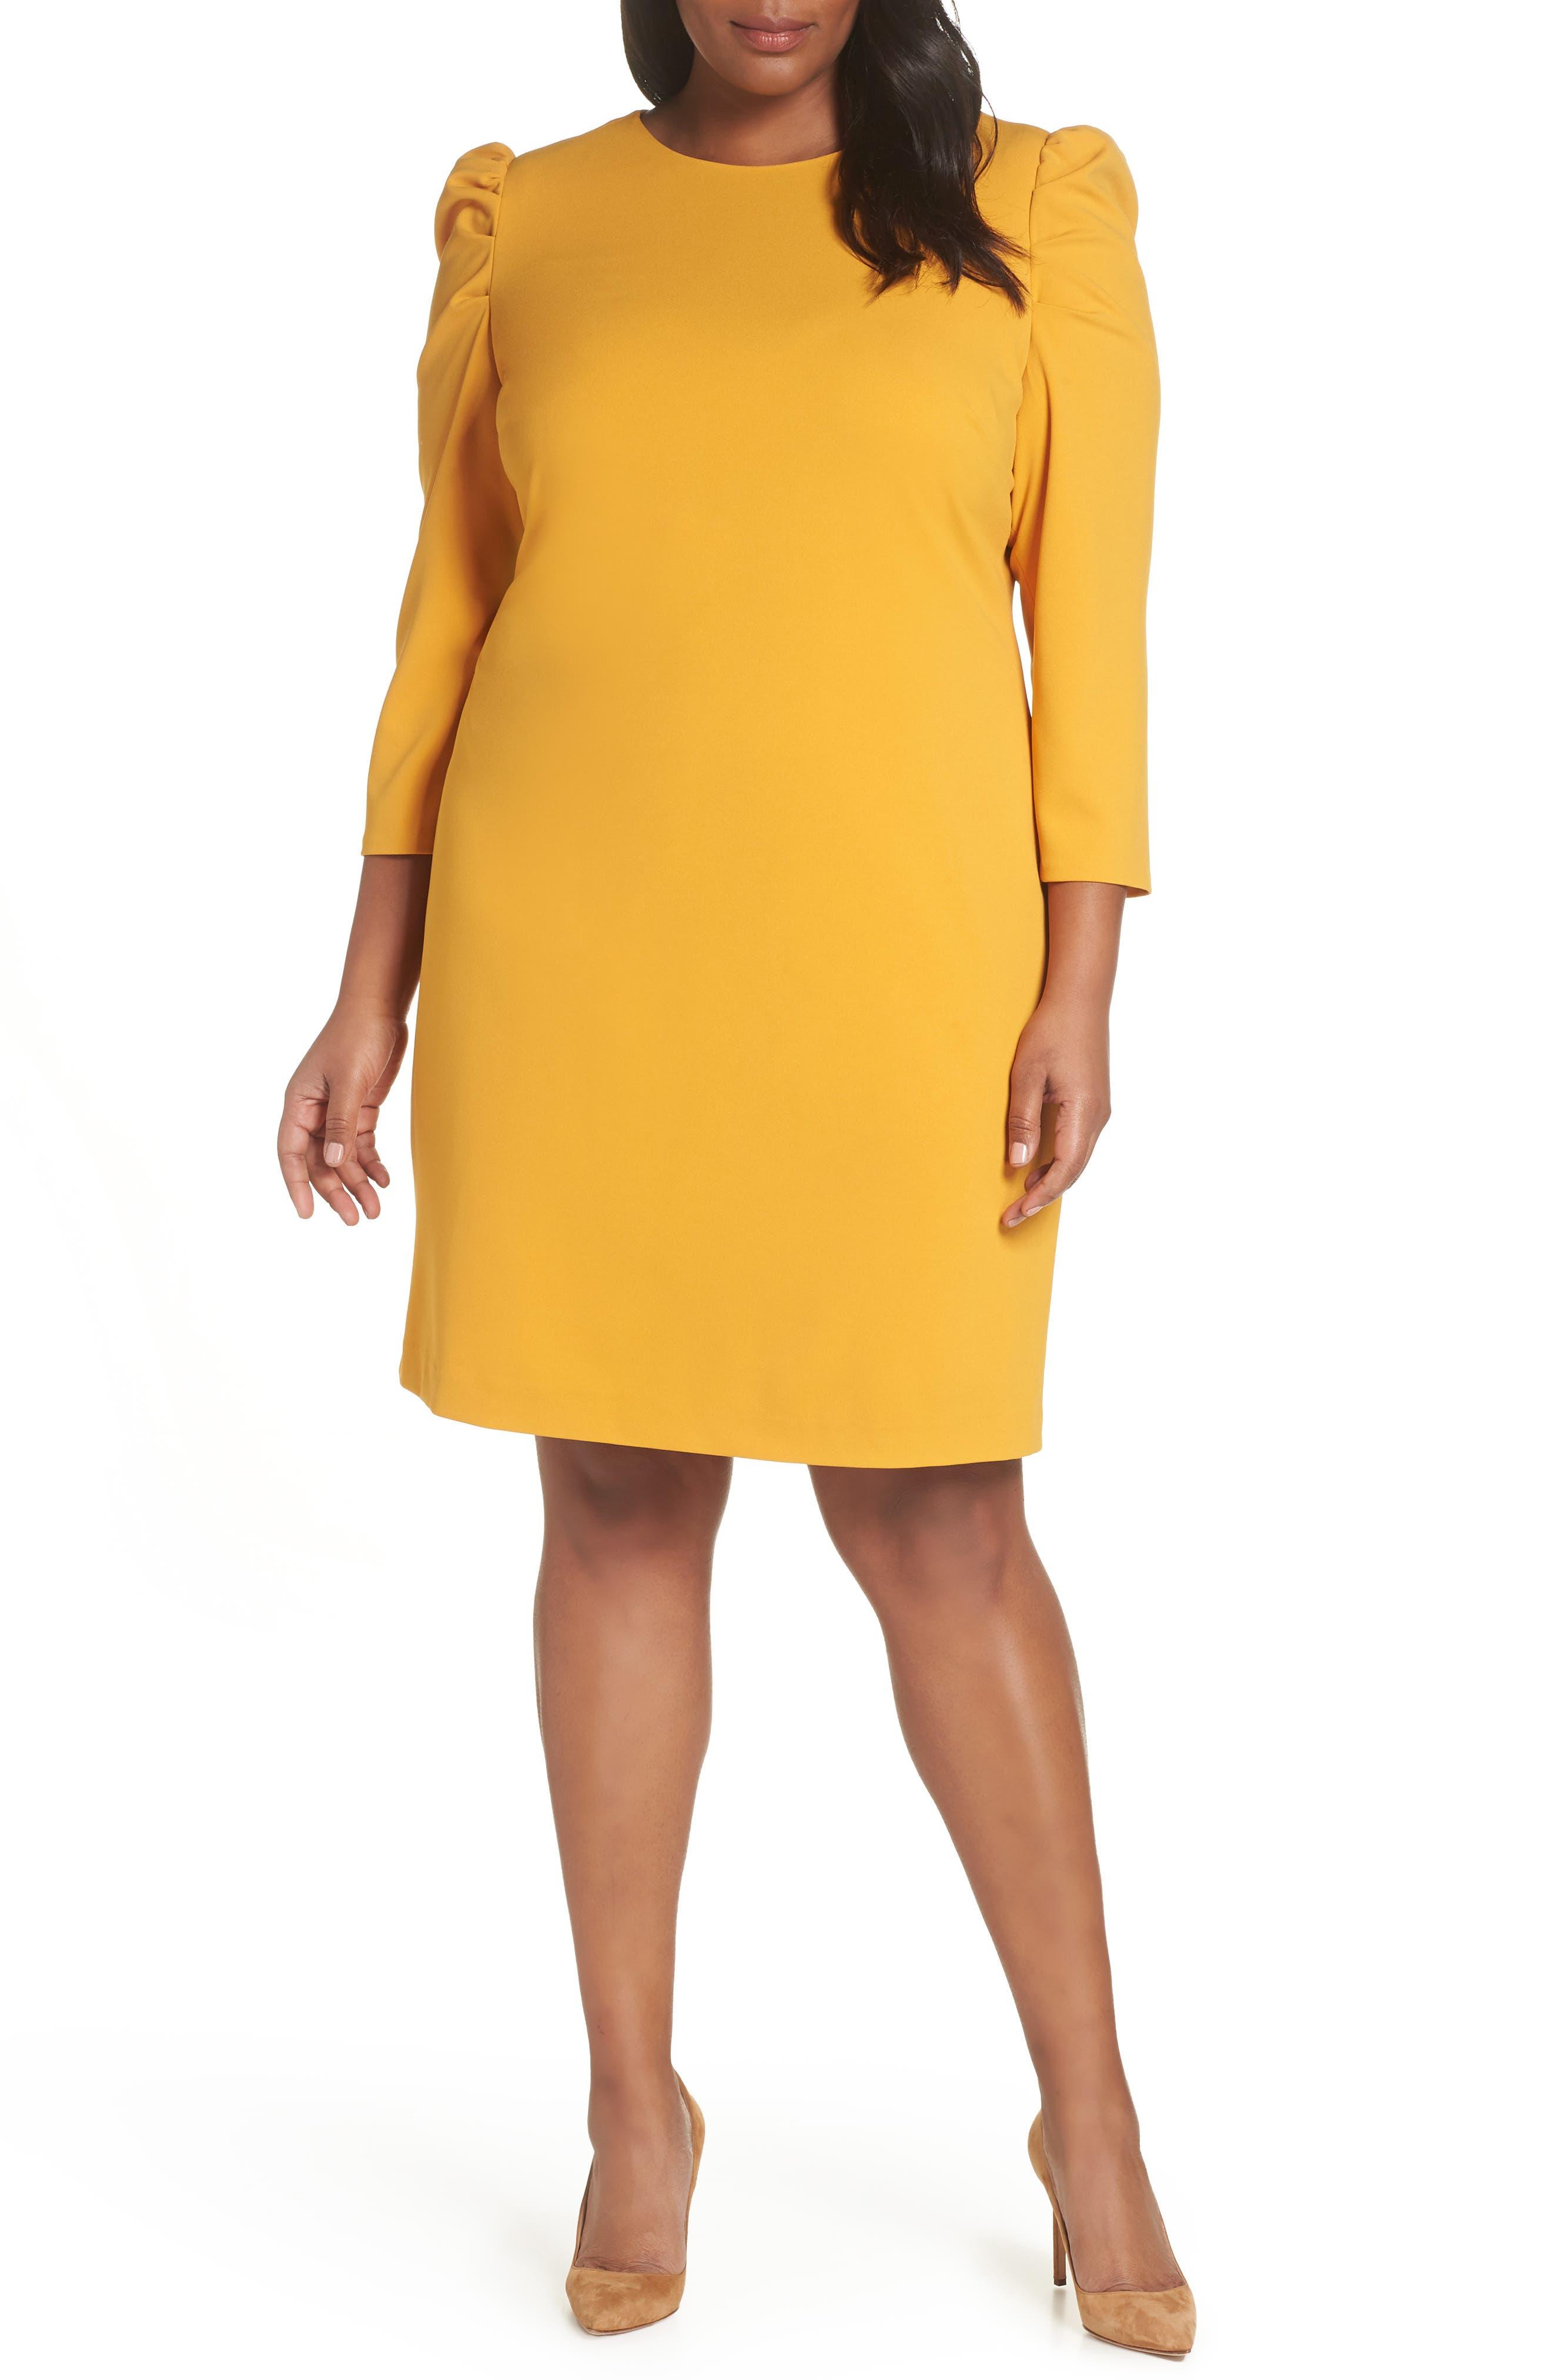 Plus Size Vince Camuto Puff Shoulder Shift Dress, Yellow